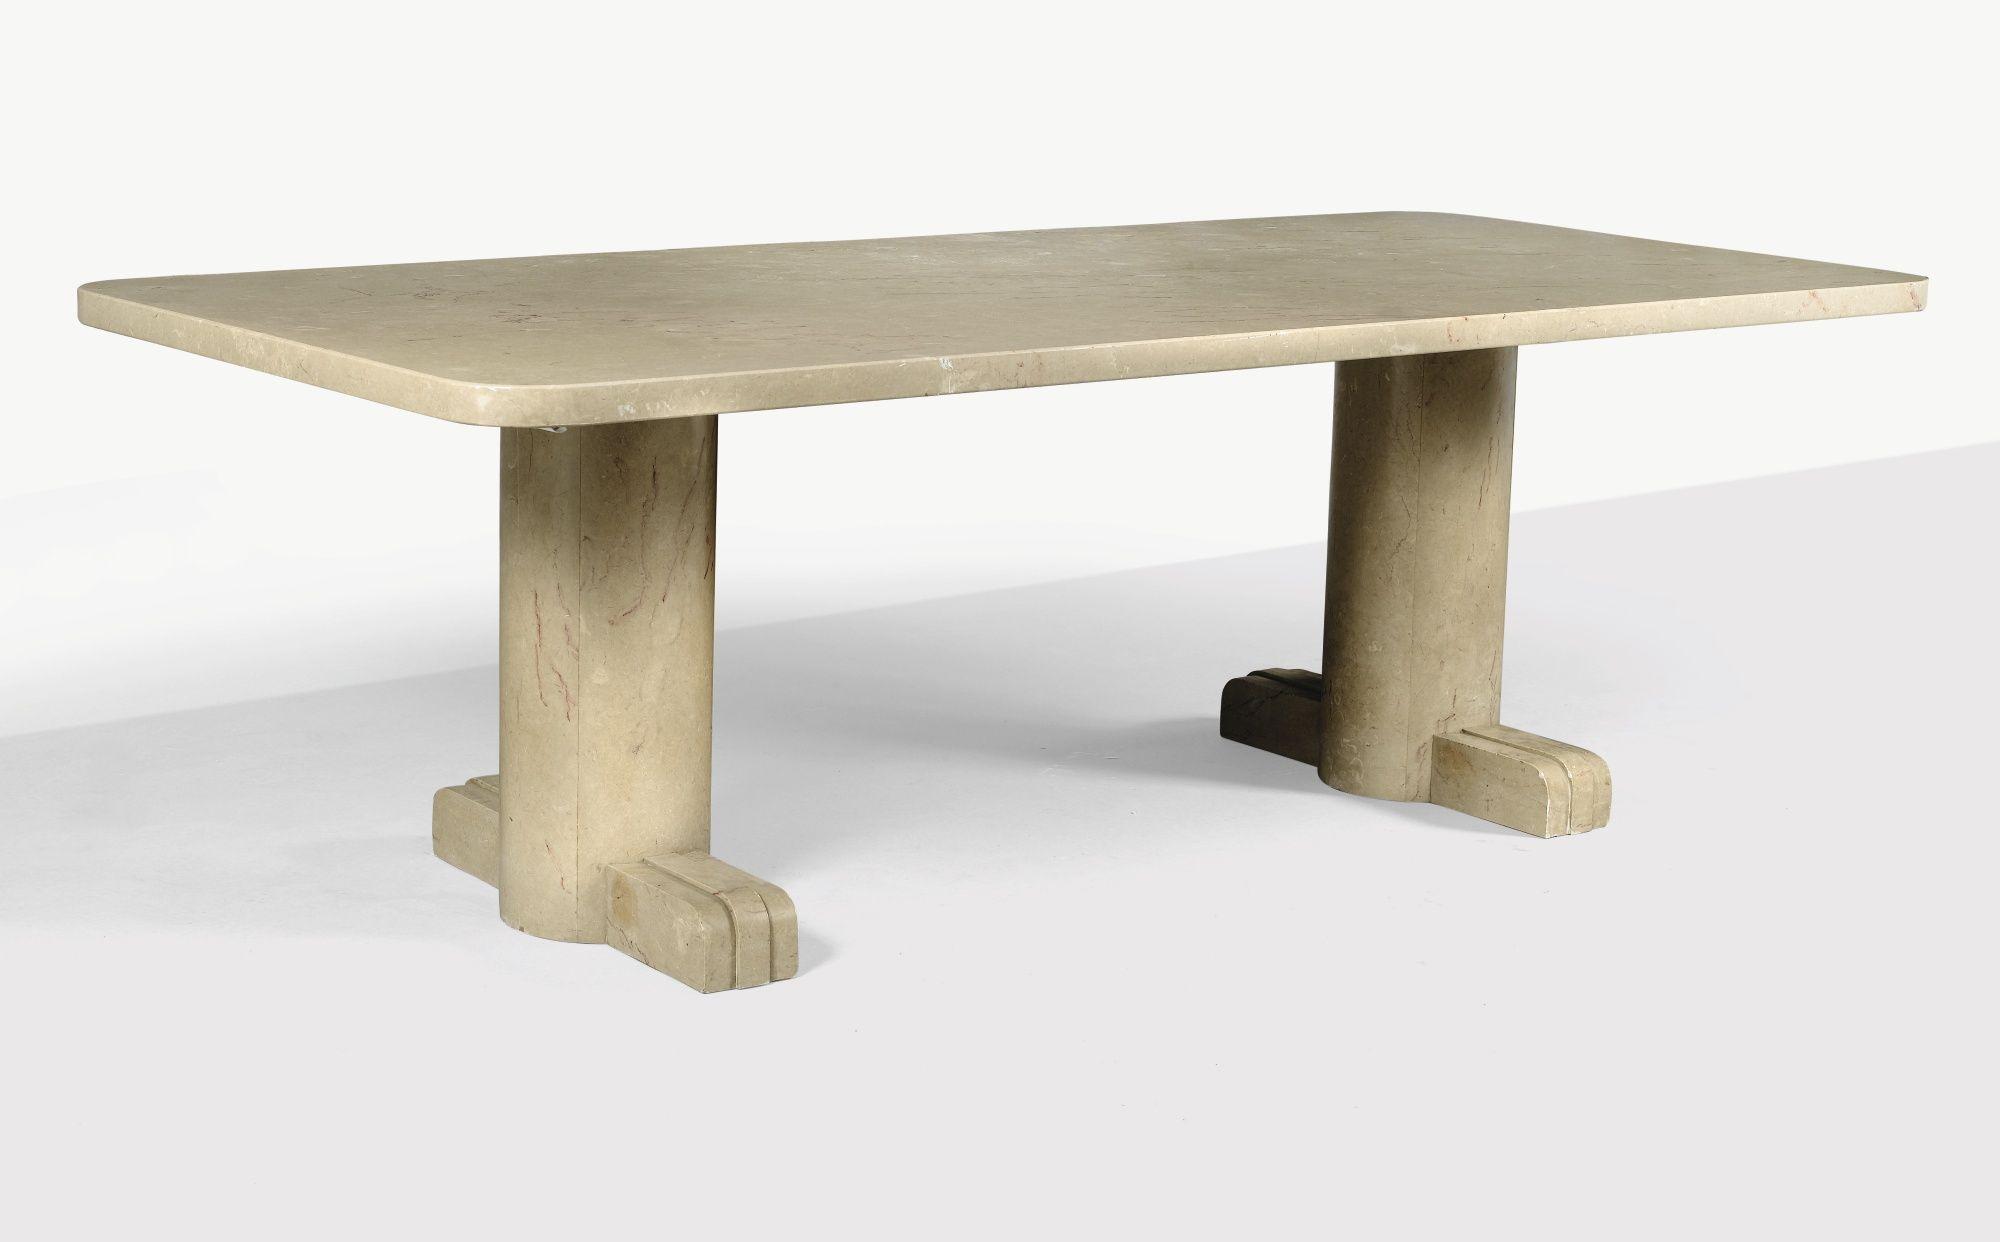 herbst rené dining table cir furniture sotheby s